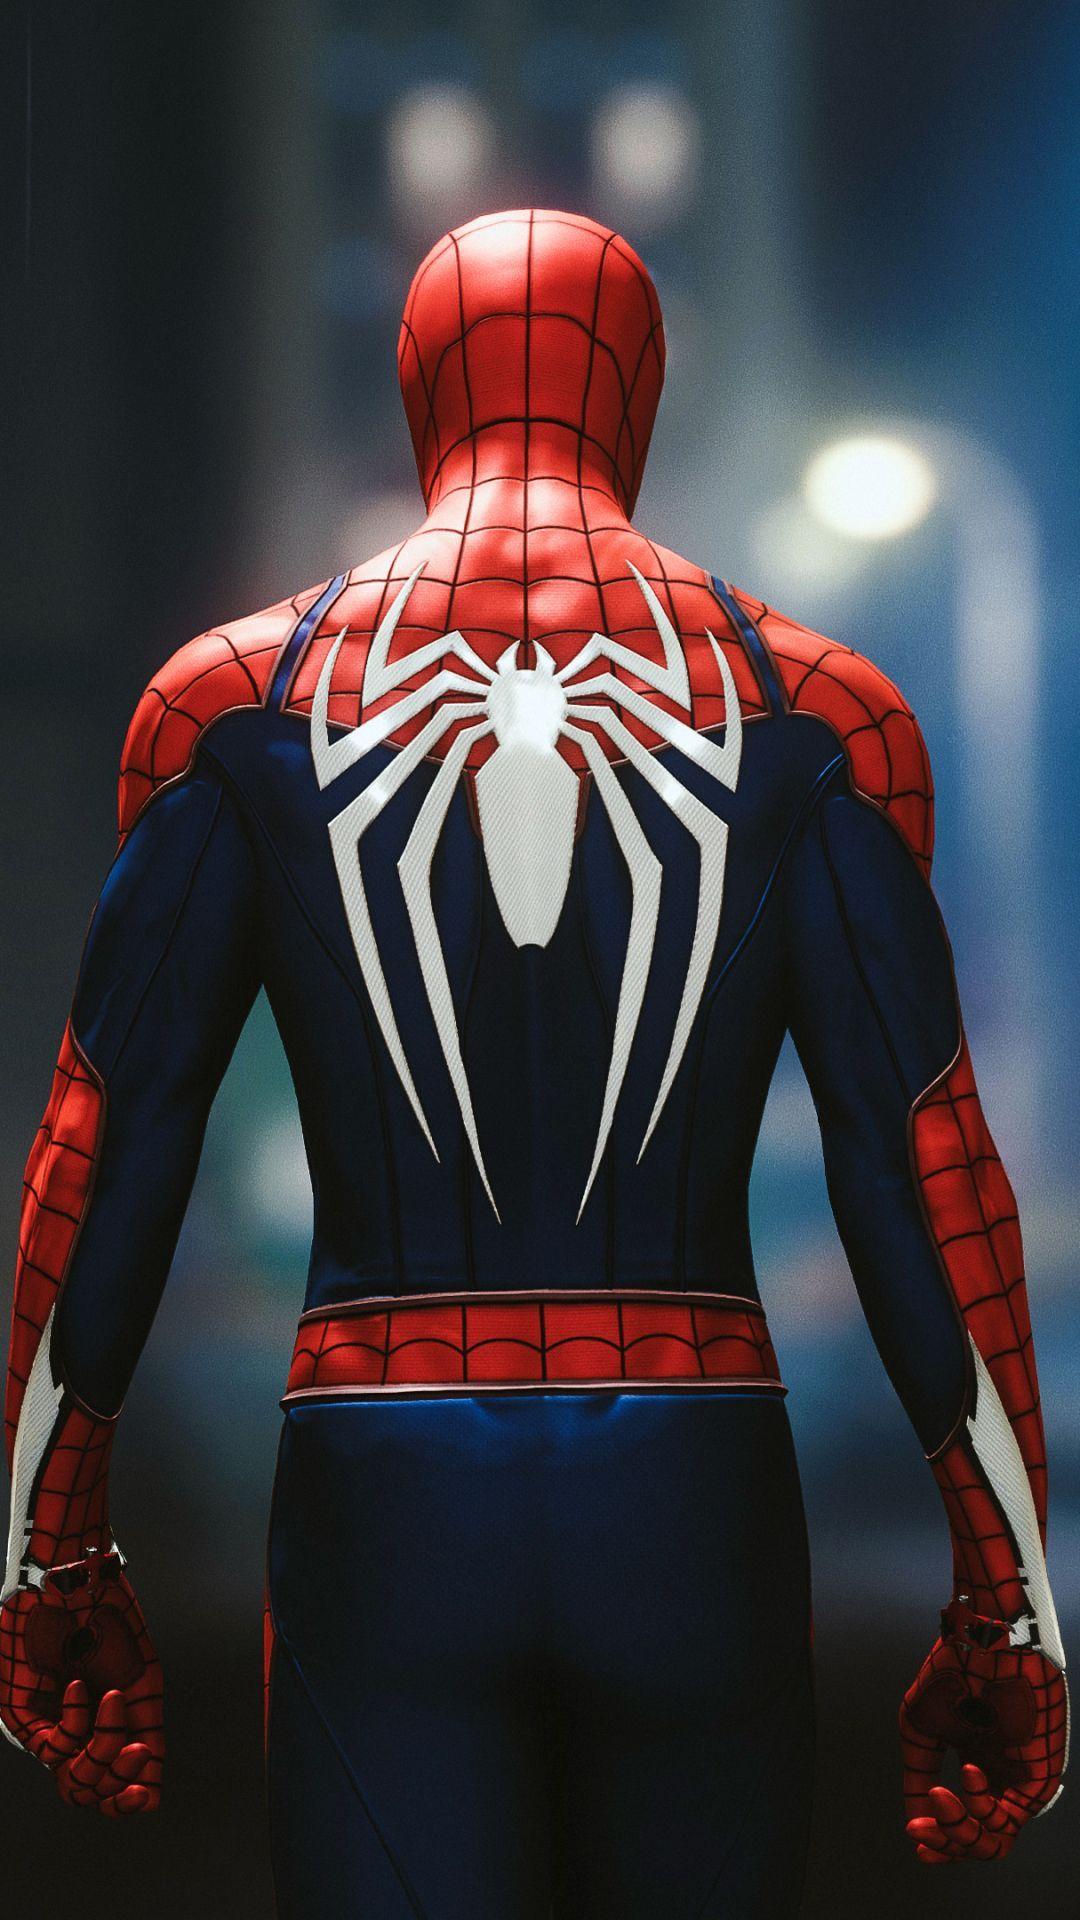 Spider Man Spider man Homecoming Avengers Infinity war Avengers 1080x1920